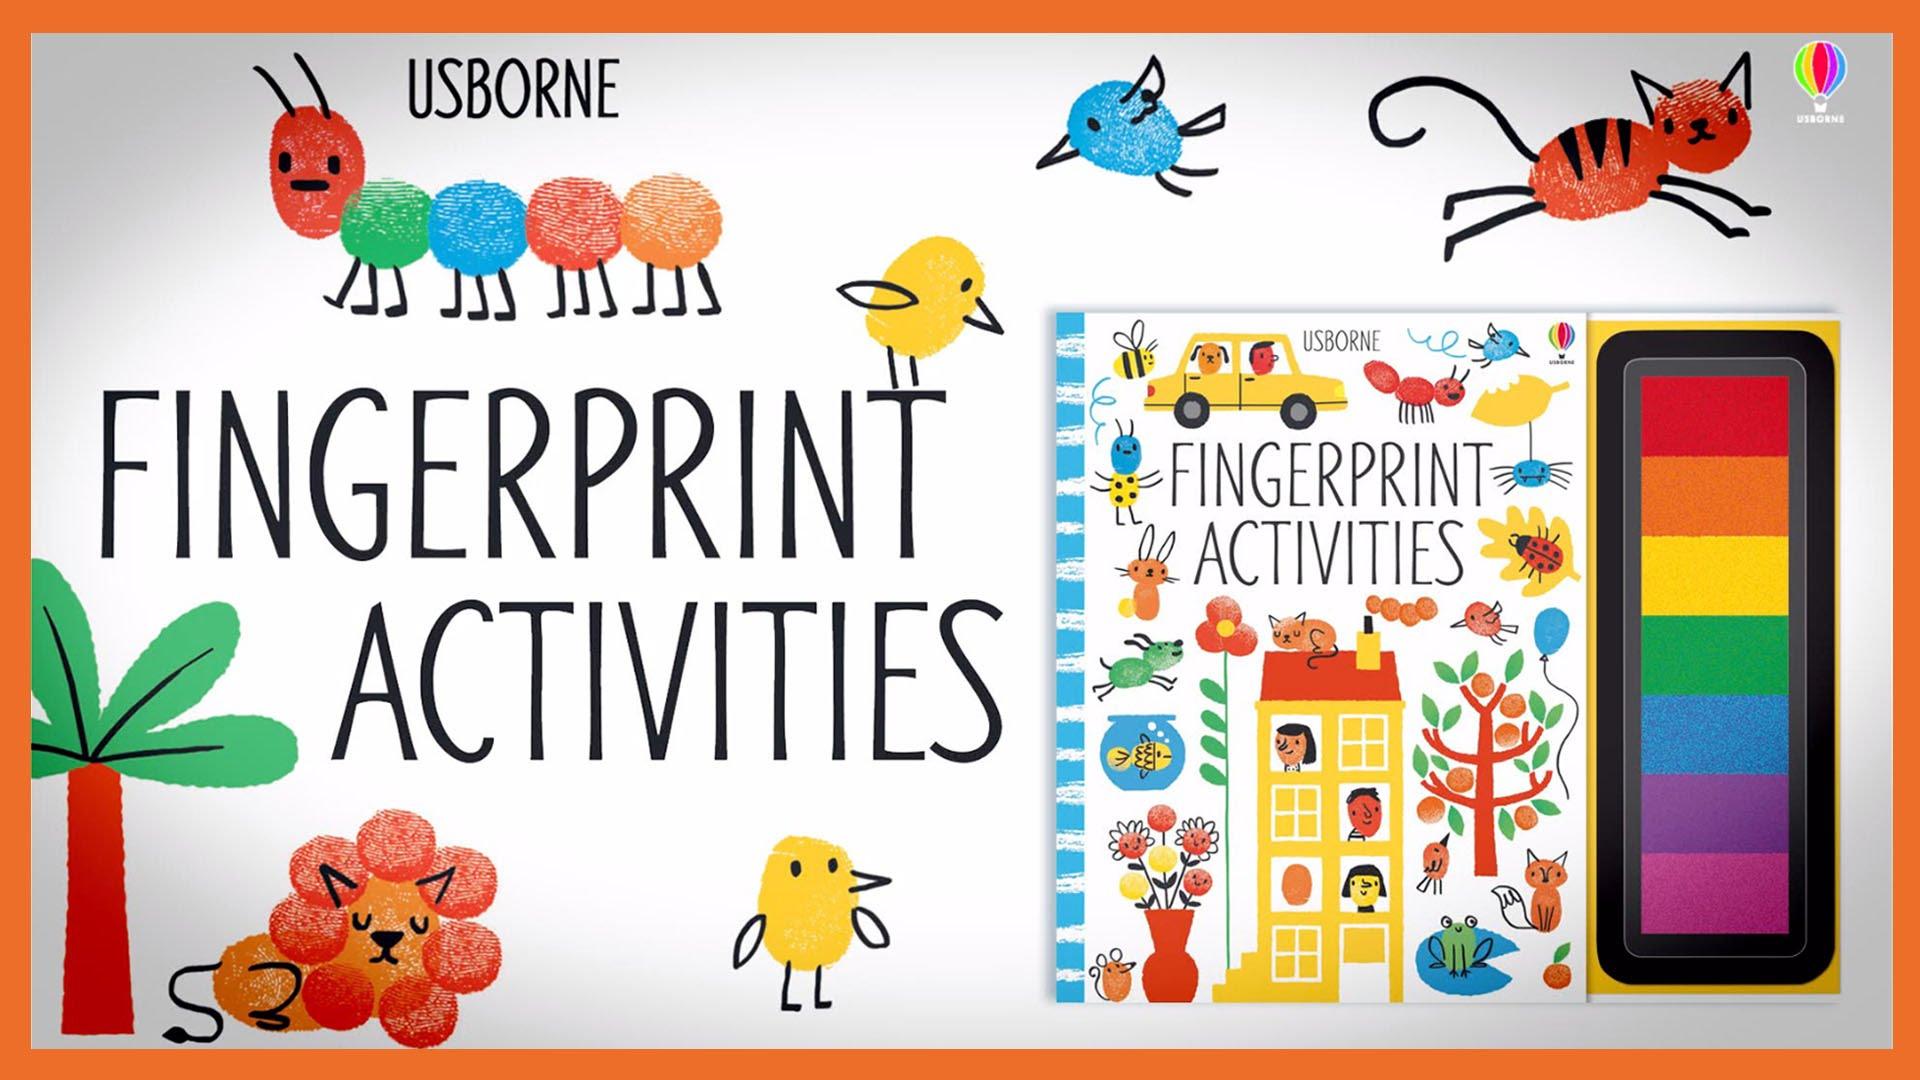 Usborne Fingerprint Activities - YouTube